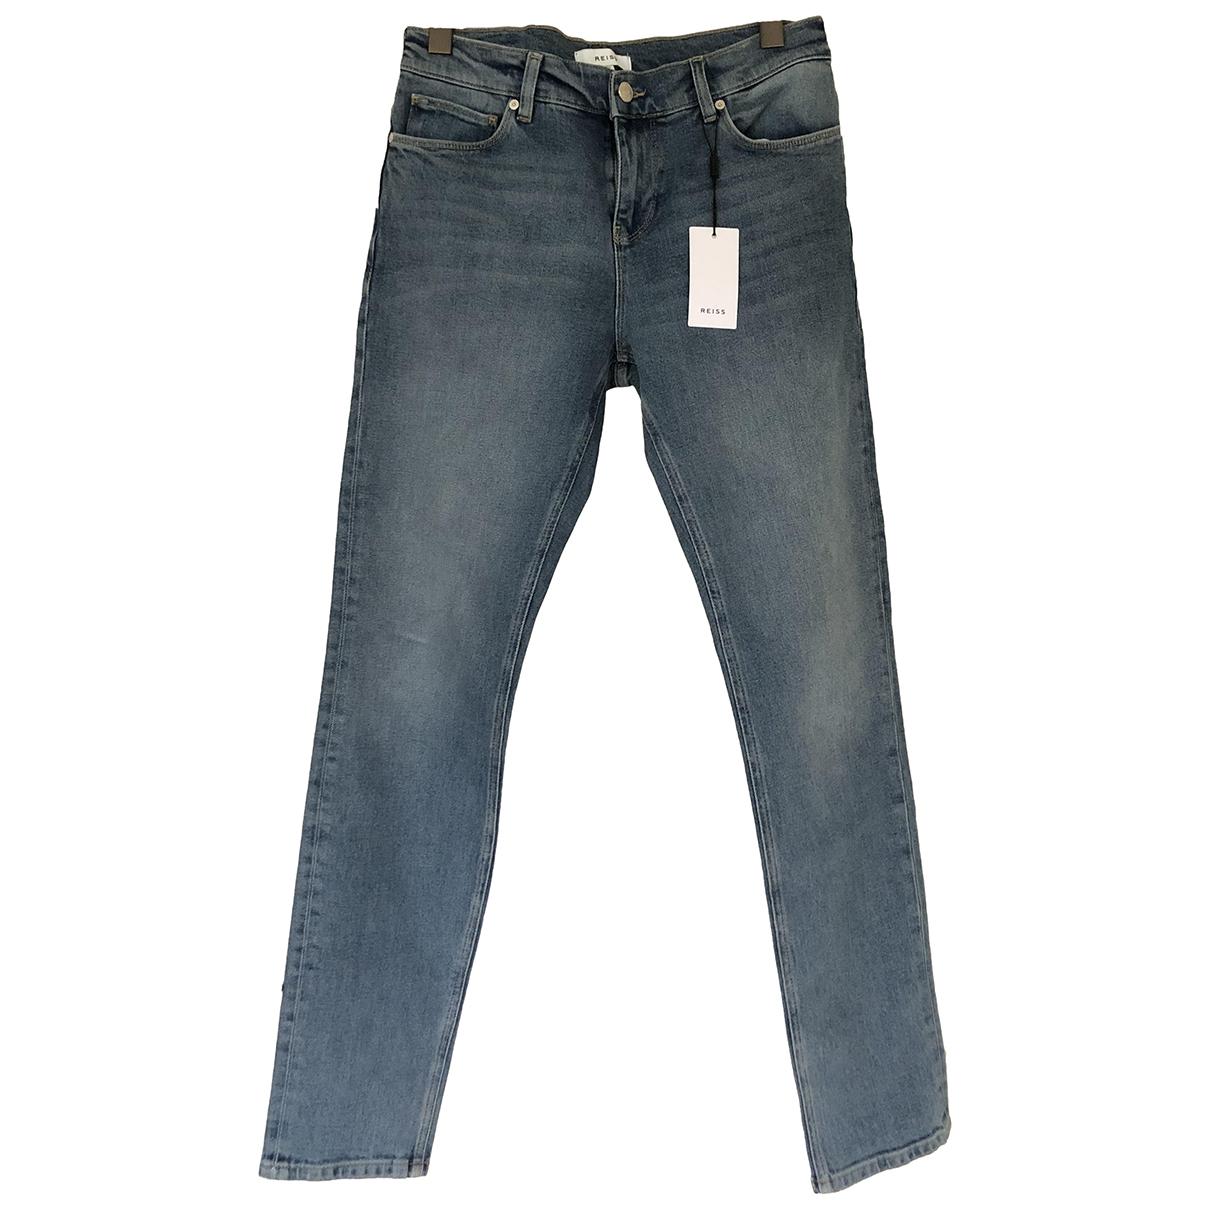 Reiss N Blue Cotton Jeans for Men 40 FR